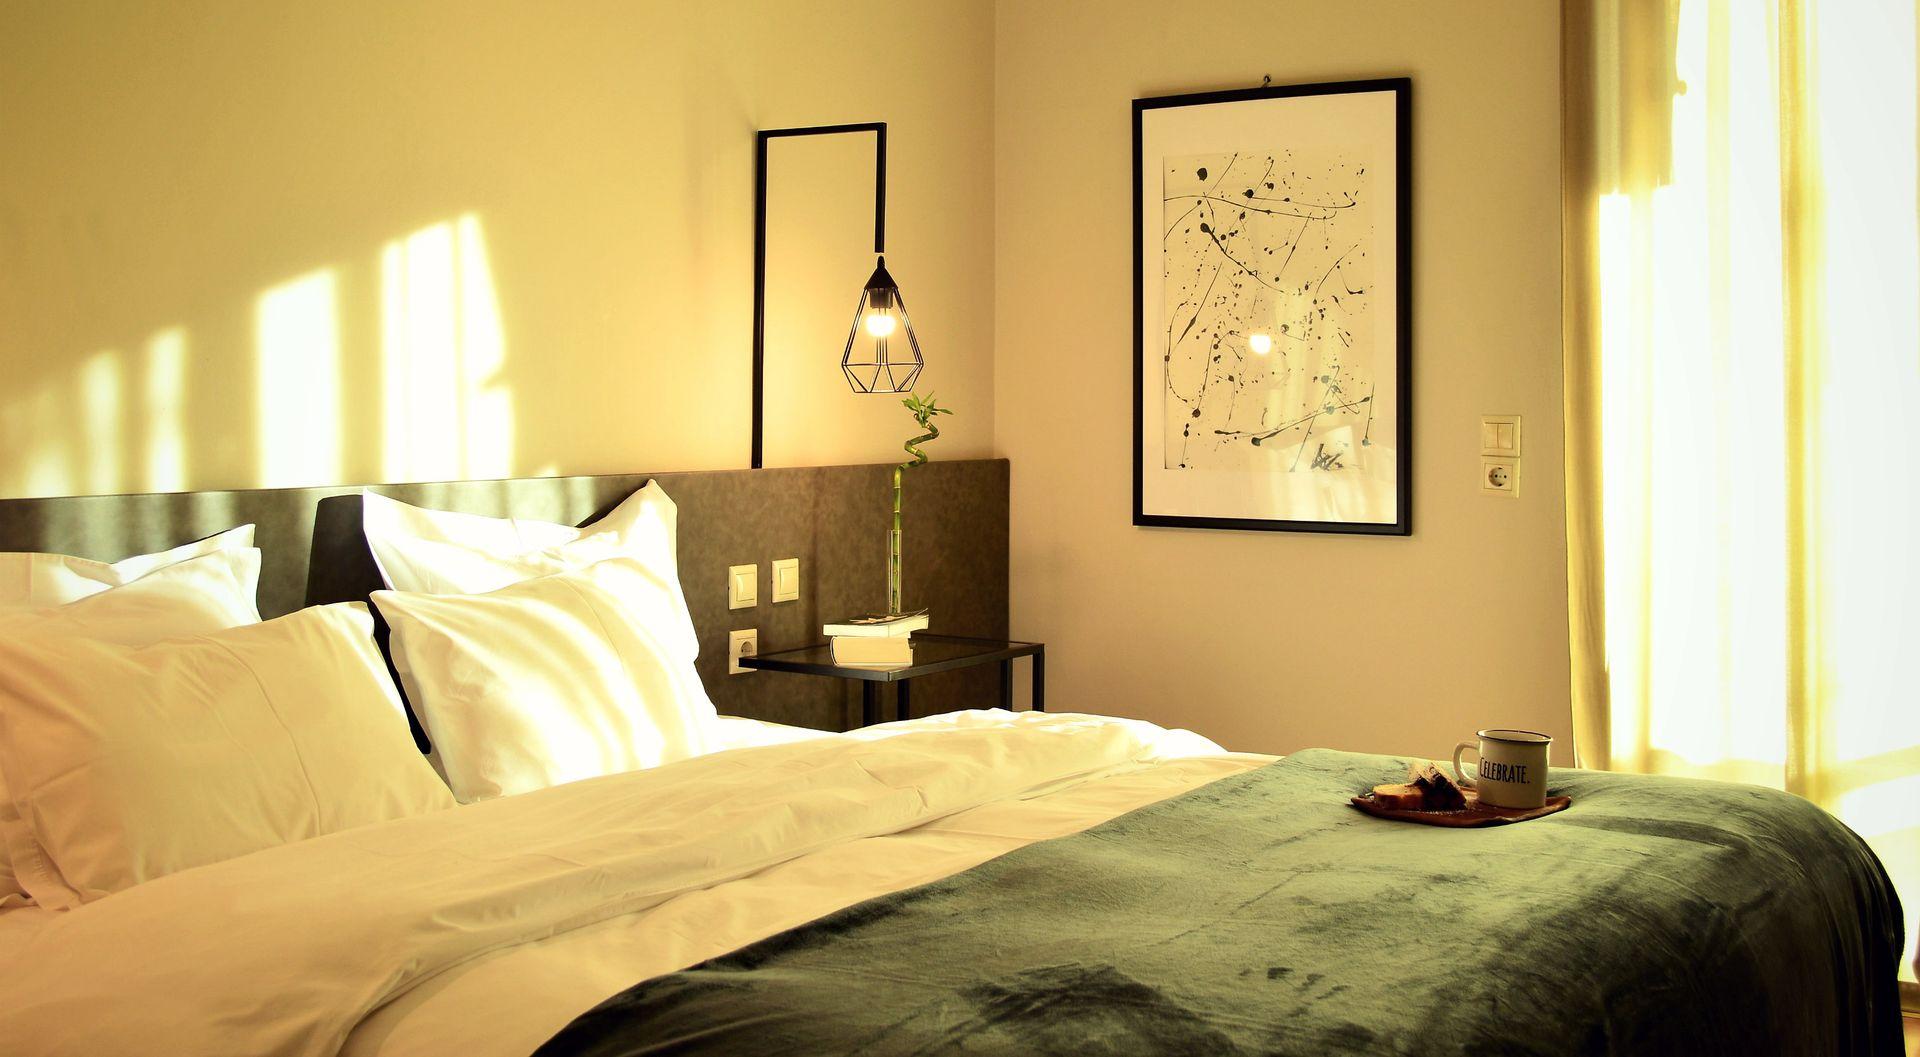 Alexakis Hotel & Spa - Λουτρά Υπάτης, Φθιώτιδα ✦ 2 Ημέρες (1 Διανυκτέρευση) ✦ 2 άτομα ✦ Χωρίς Πρωινό ✦ έως 10/03/2021 ✦ Κοντά στις ιαματικές πηγές της Υπάτης!